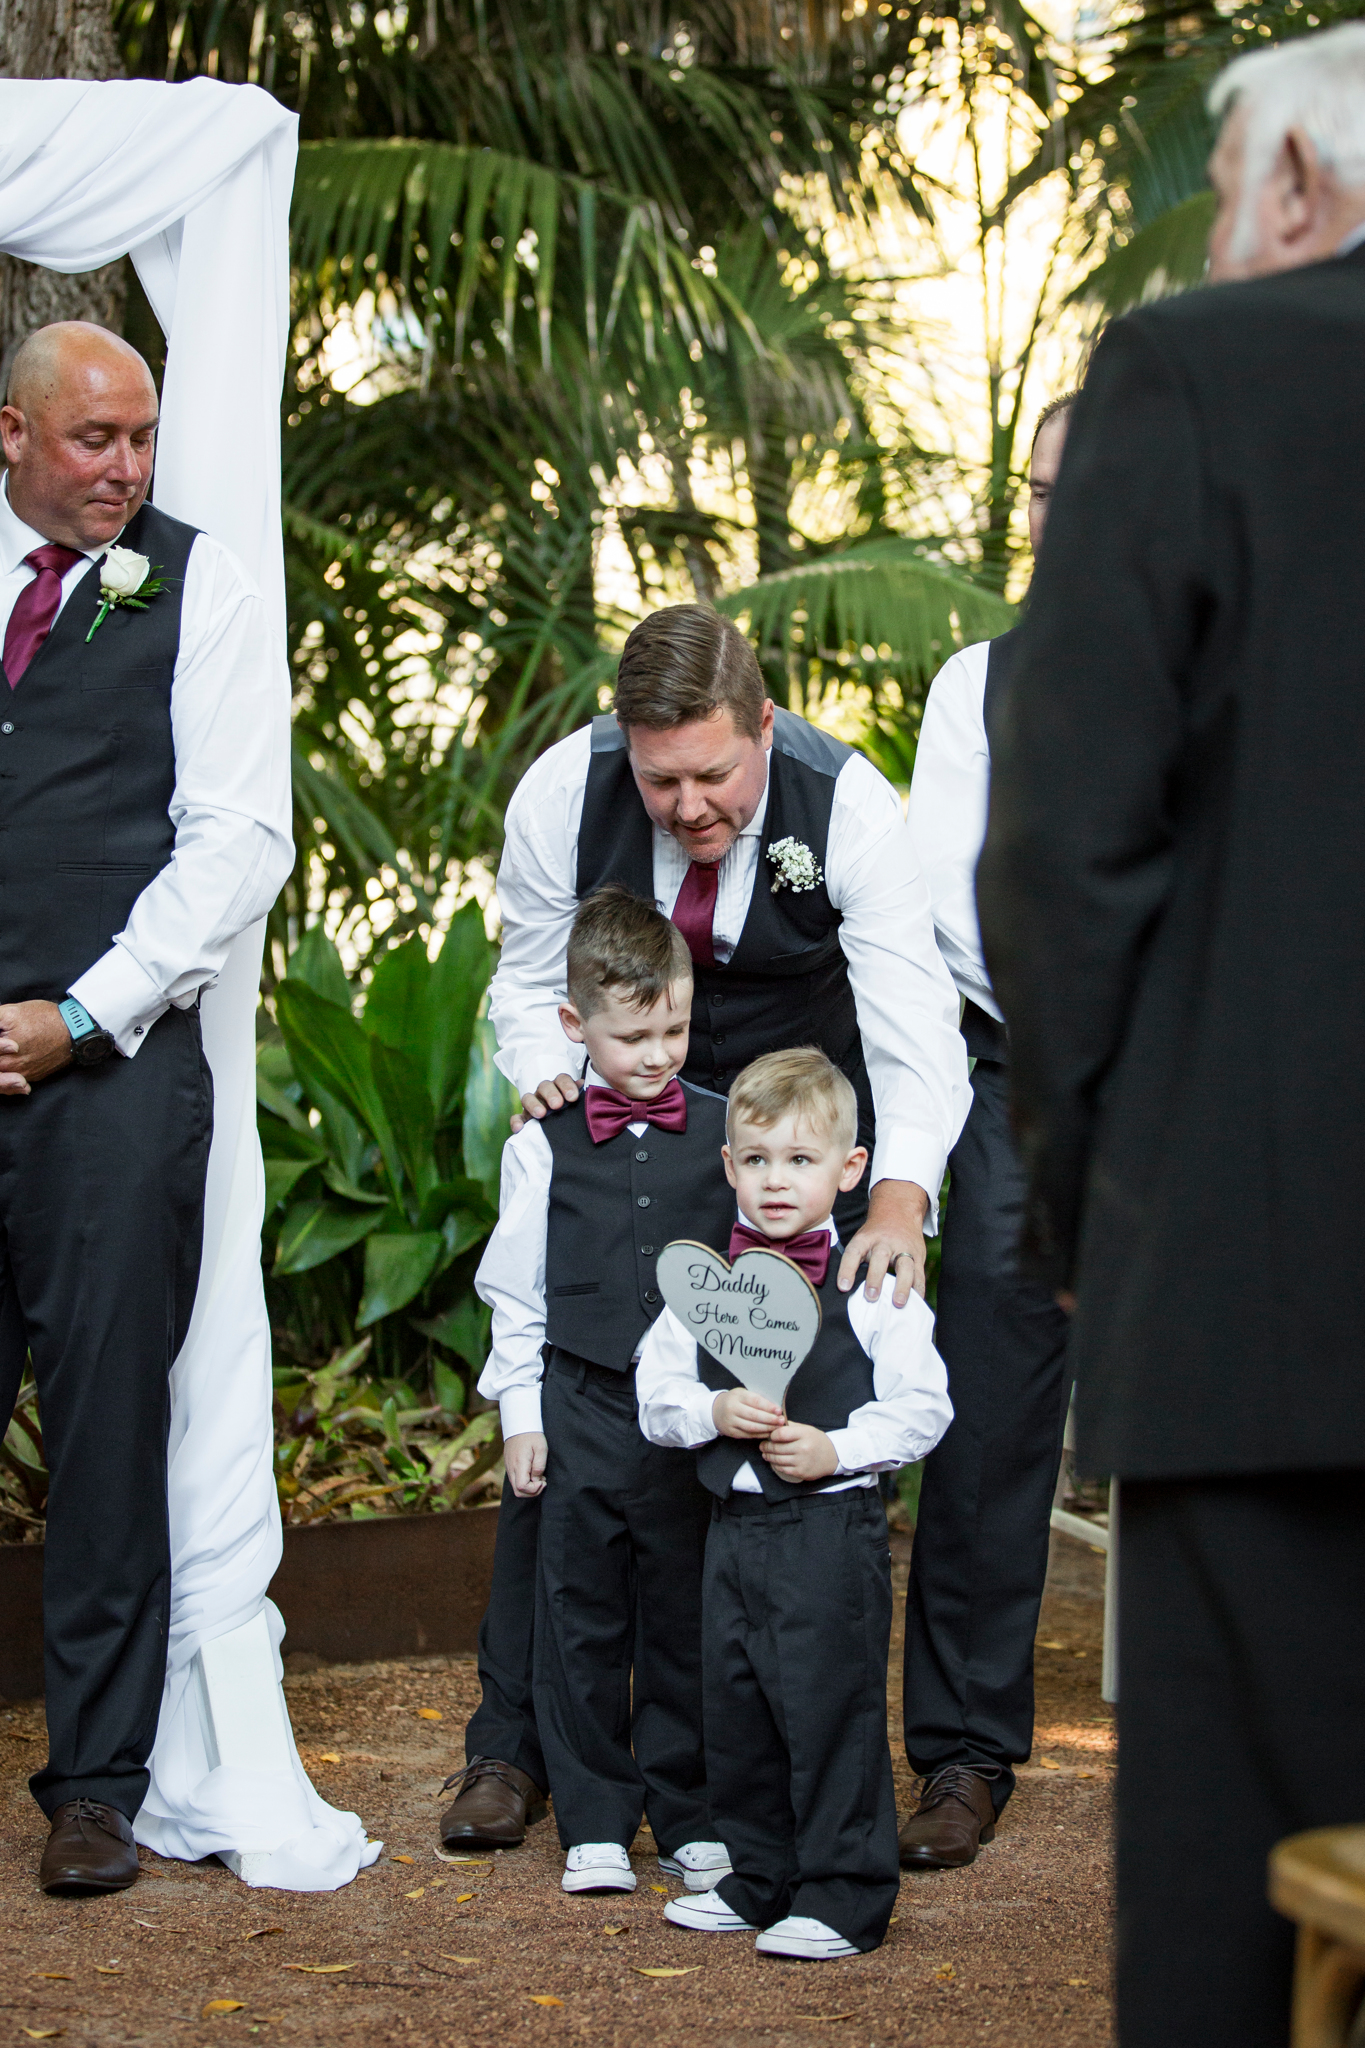 Kyme-steve-wedding-52.jpg